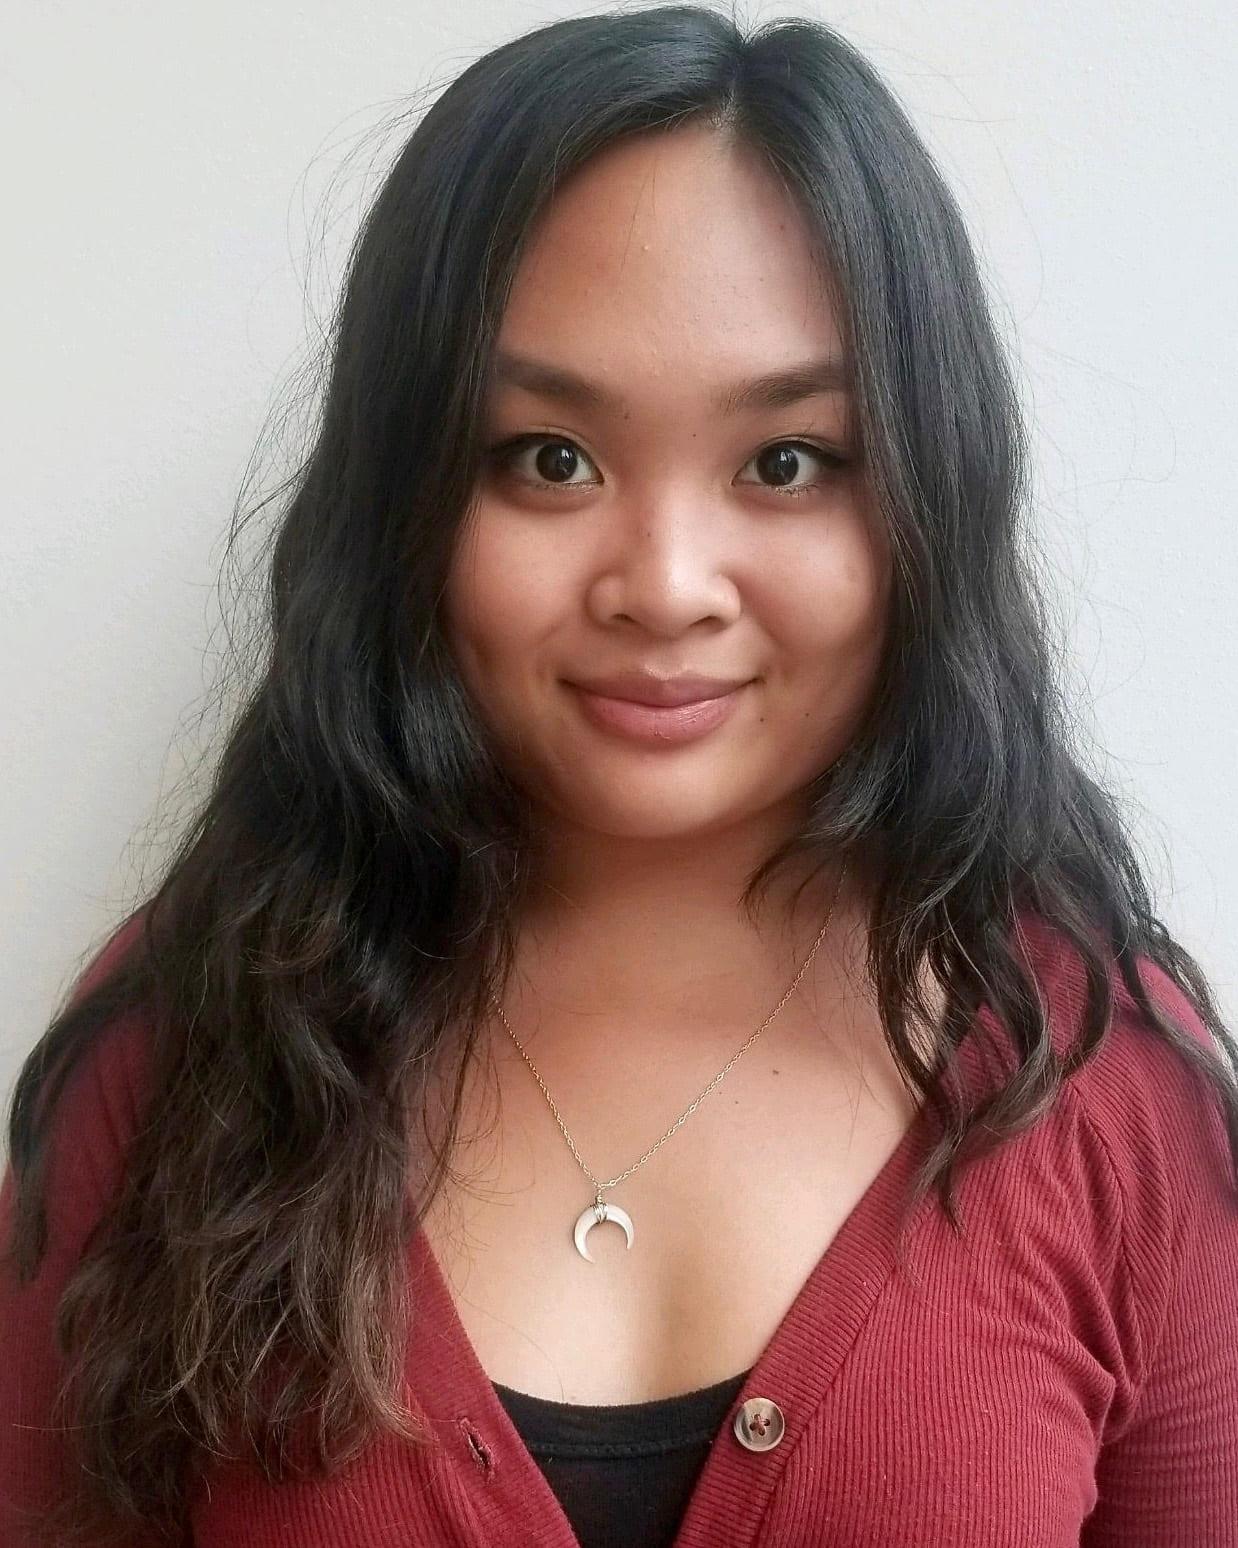 Melaina Legaspi